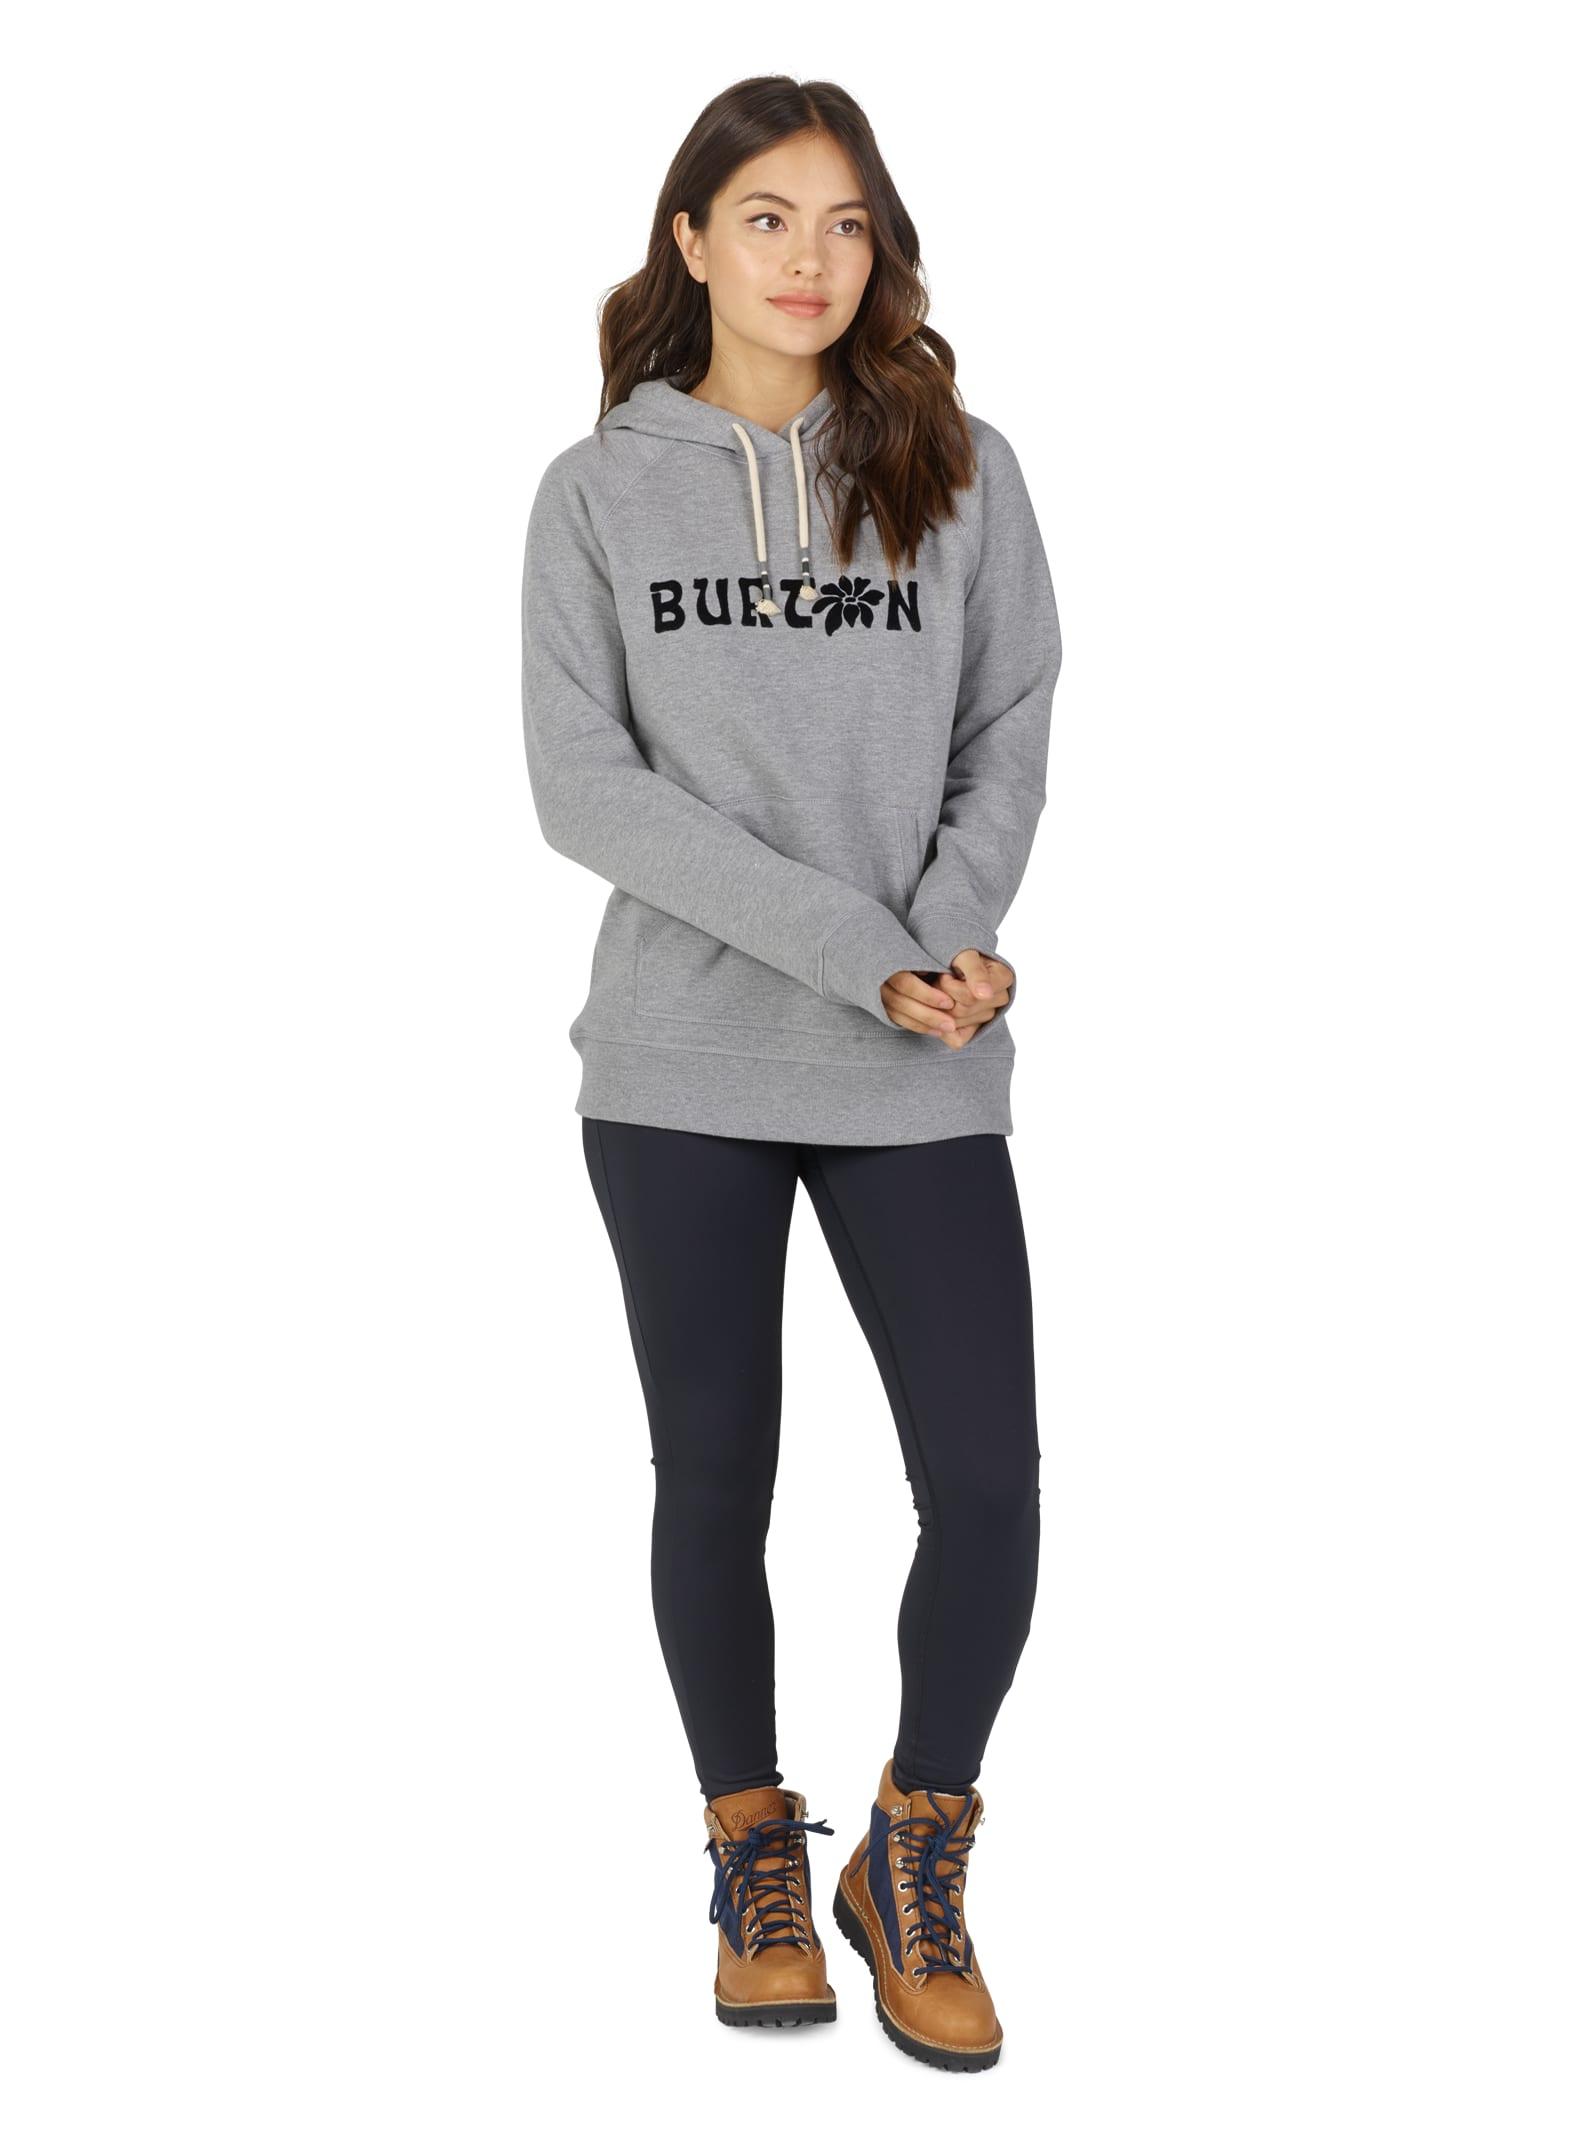 premium true fid zipper burton hoodie hooded w sleeper black